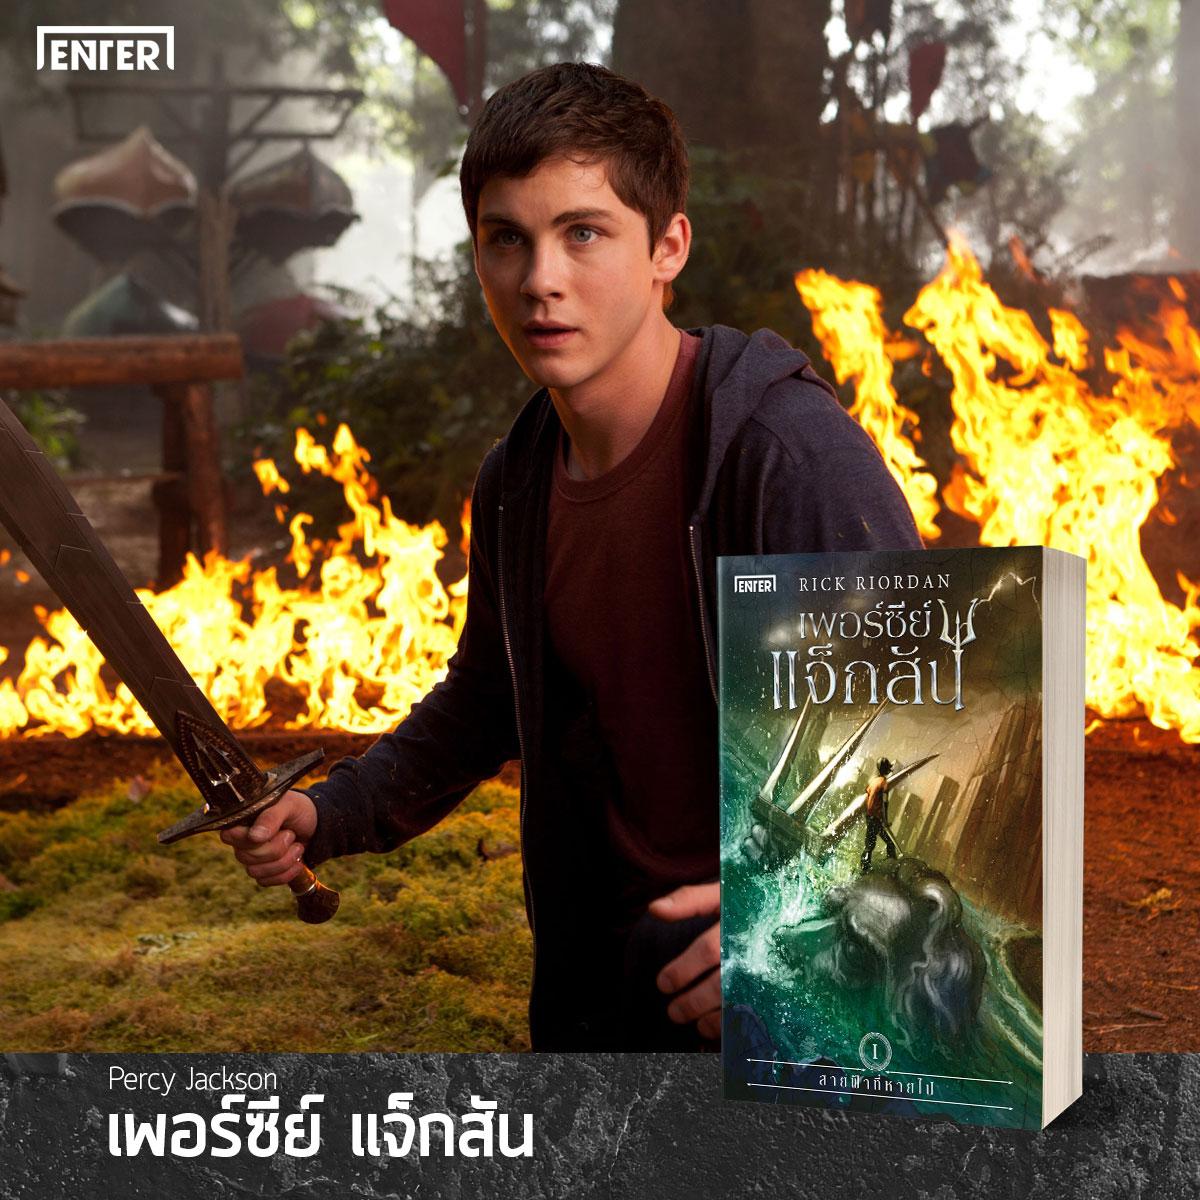 Enter_Movies_Percy